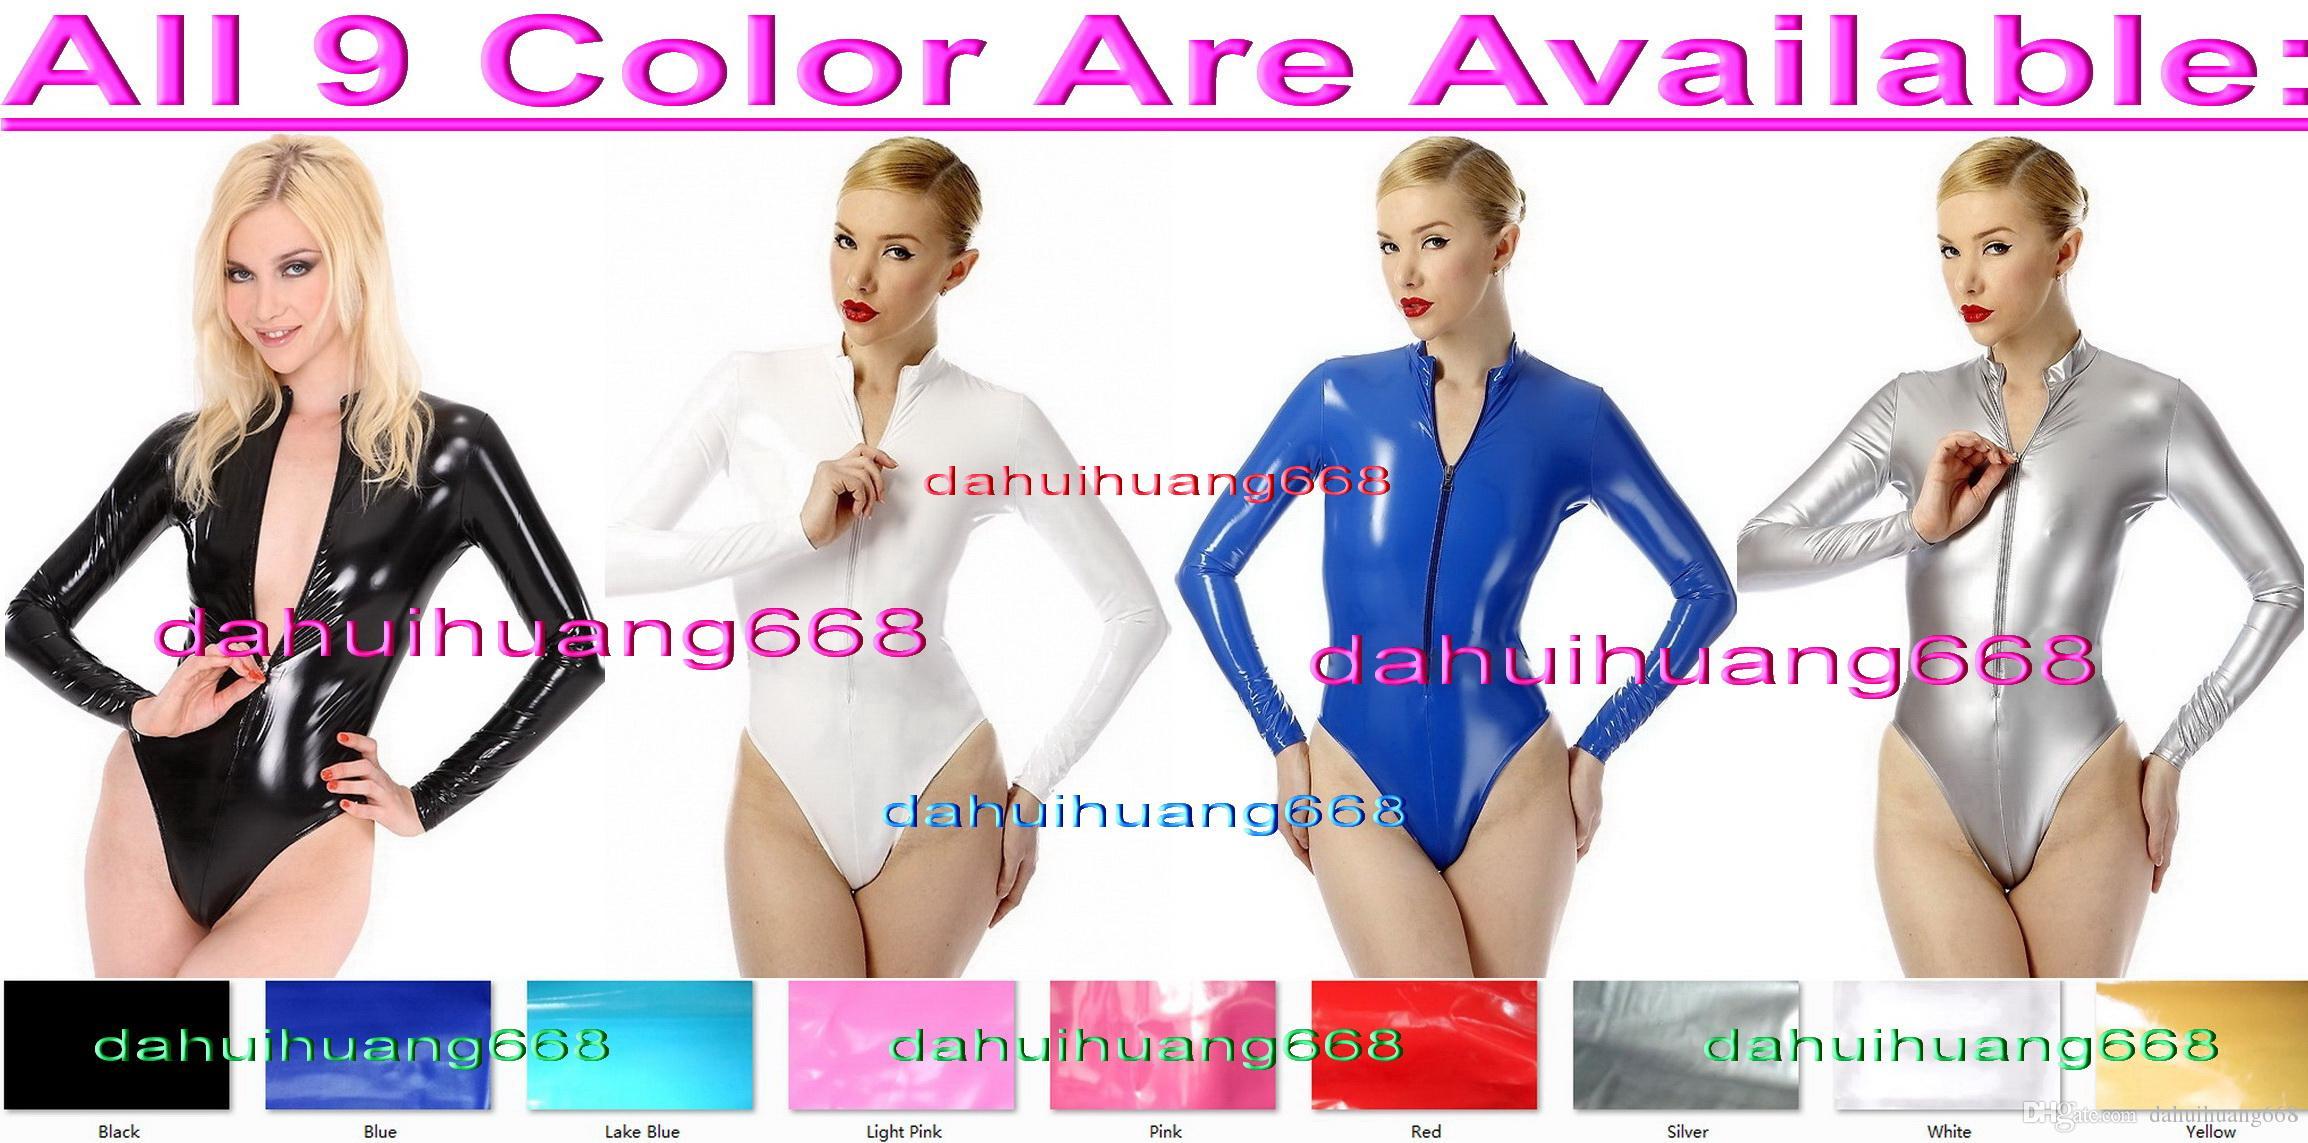 Sexy Shont PVC Body Suit Costumes Sexy 9 Color Shiny PVC Short Suit Catsuit Costumes Unisex Short Bodysuit Costumes With Front Zipper DH220